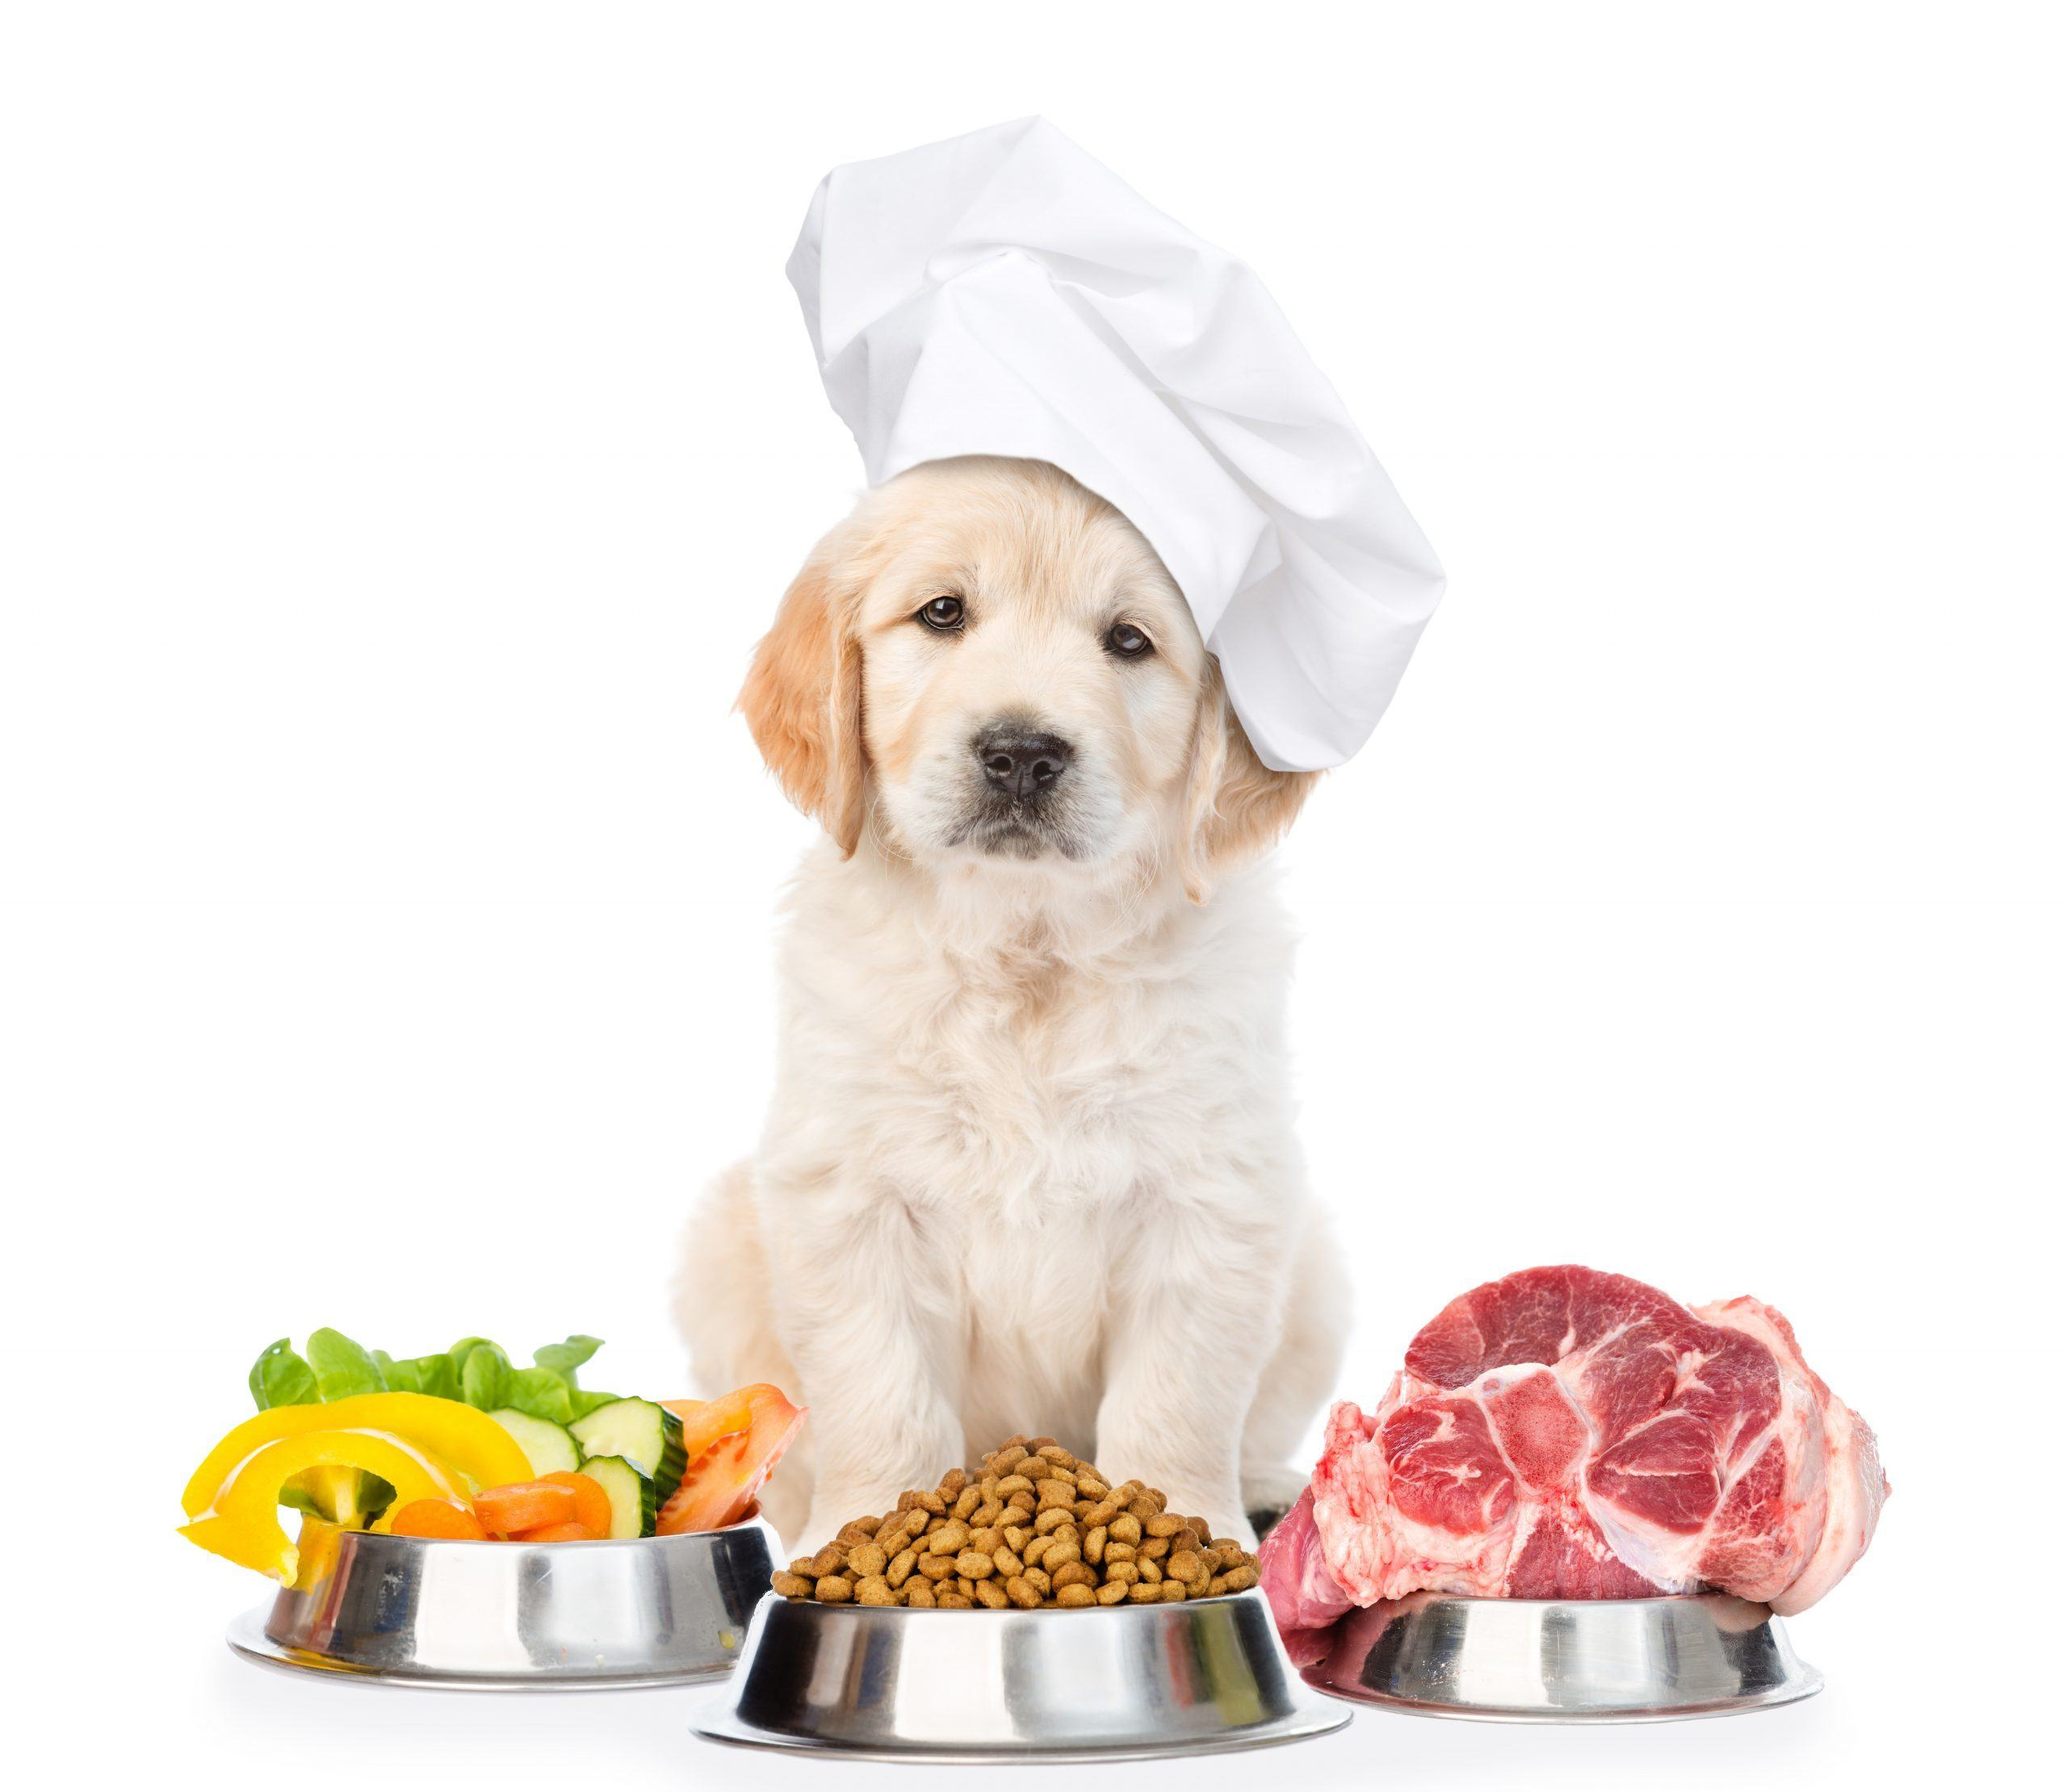 puppy baker